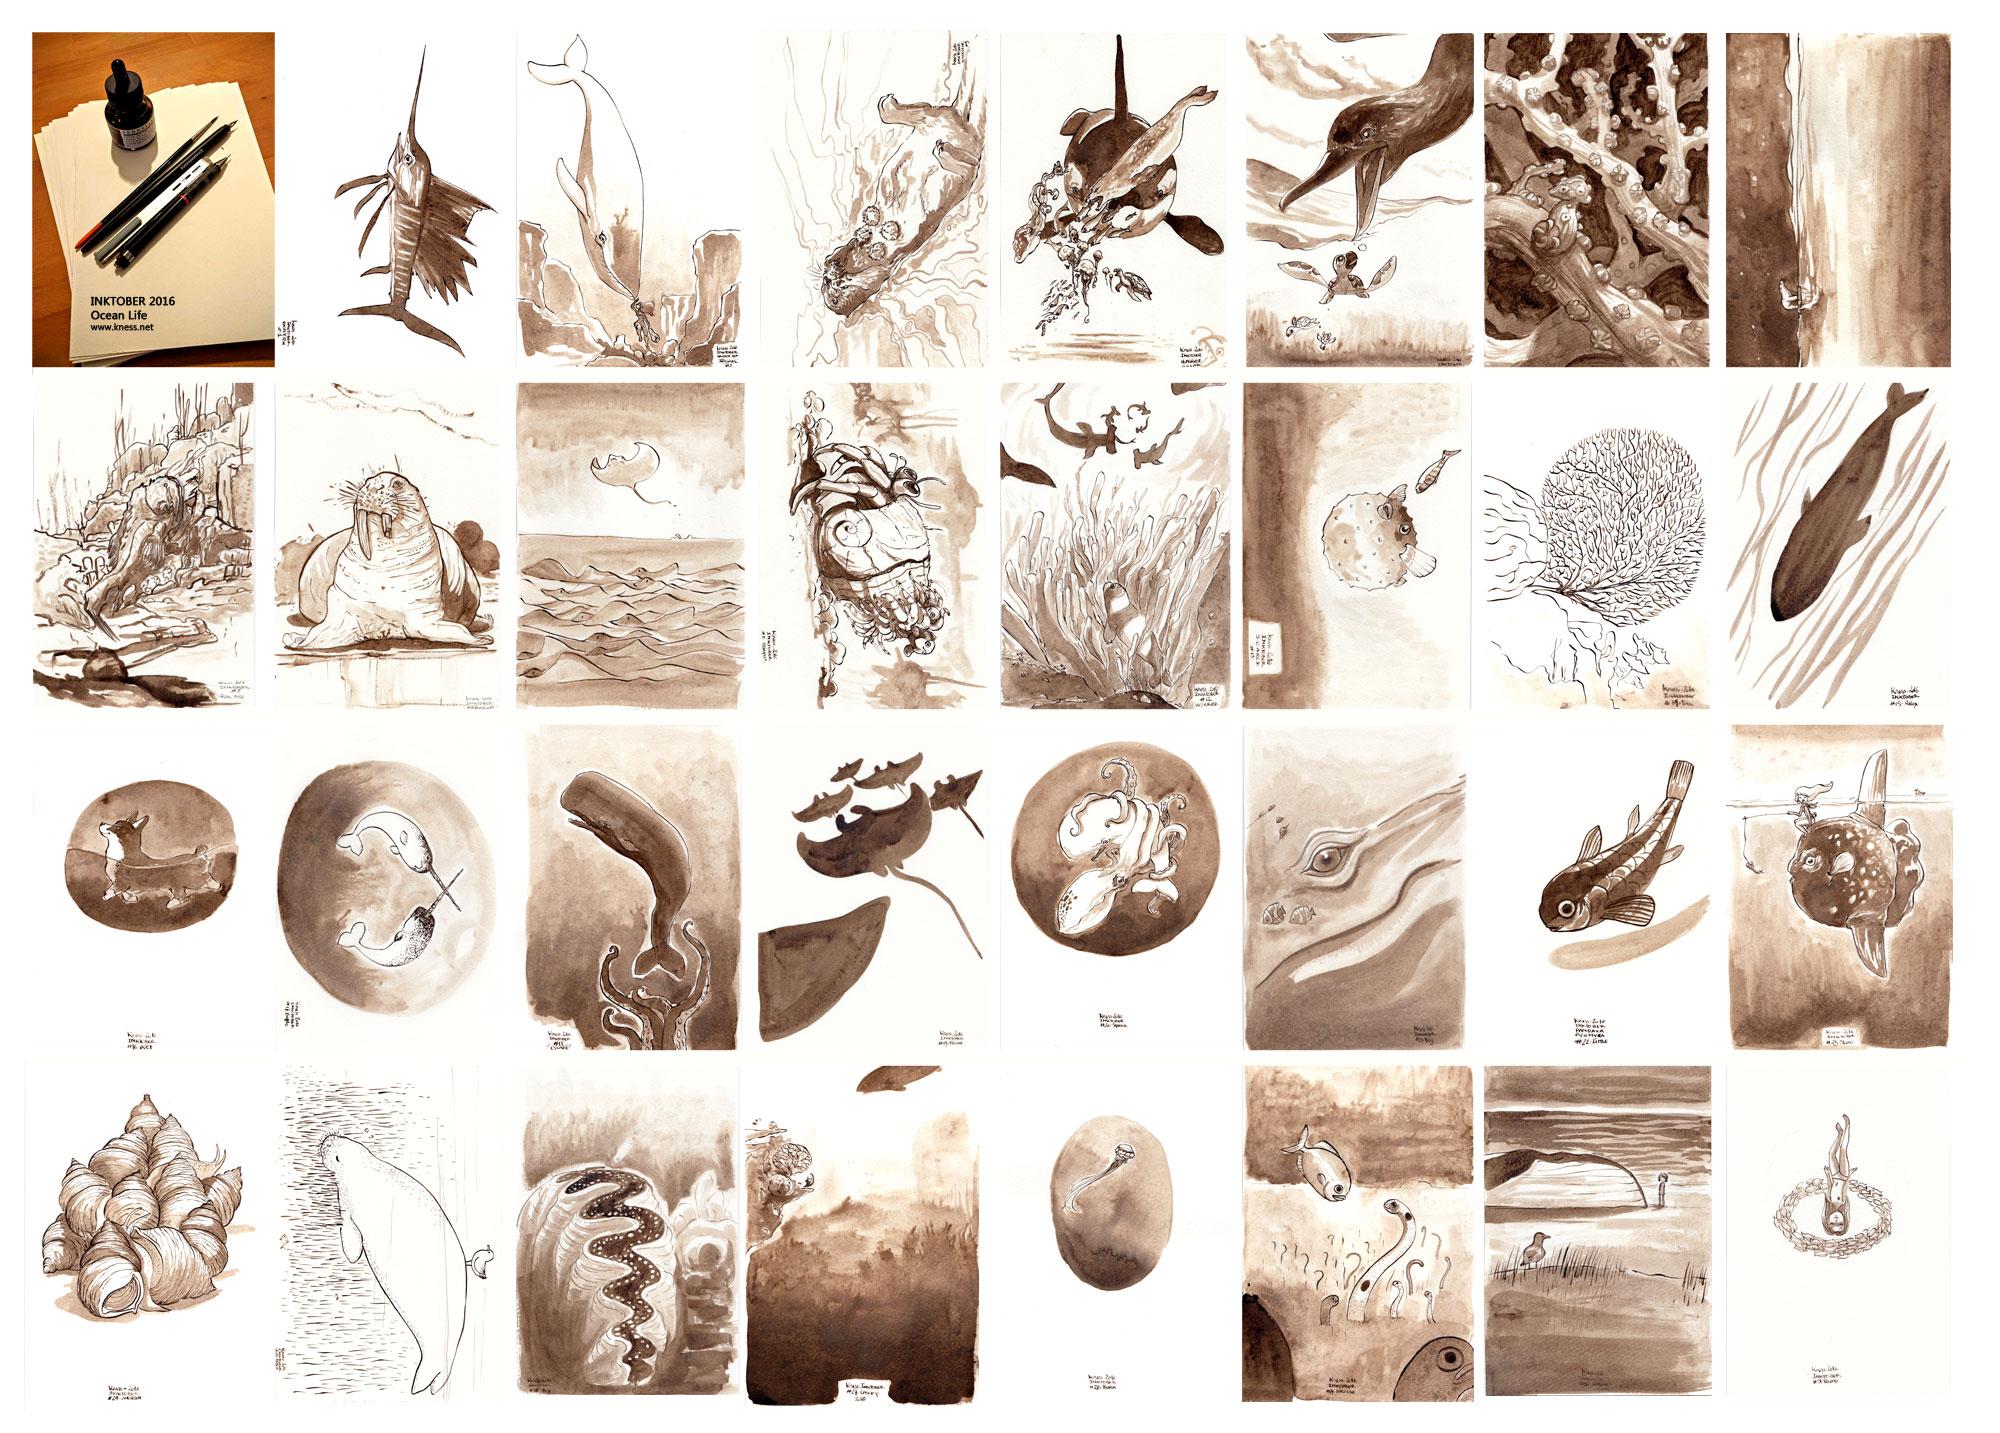 Inktober 2016 - la faune marine + la liste officielle